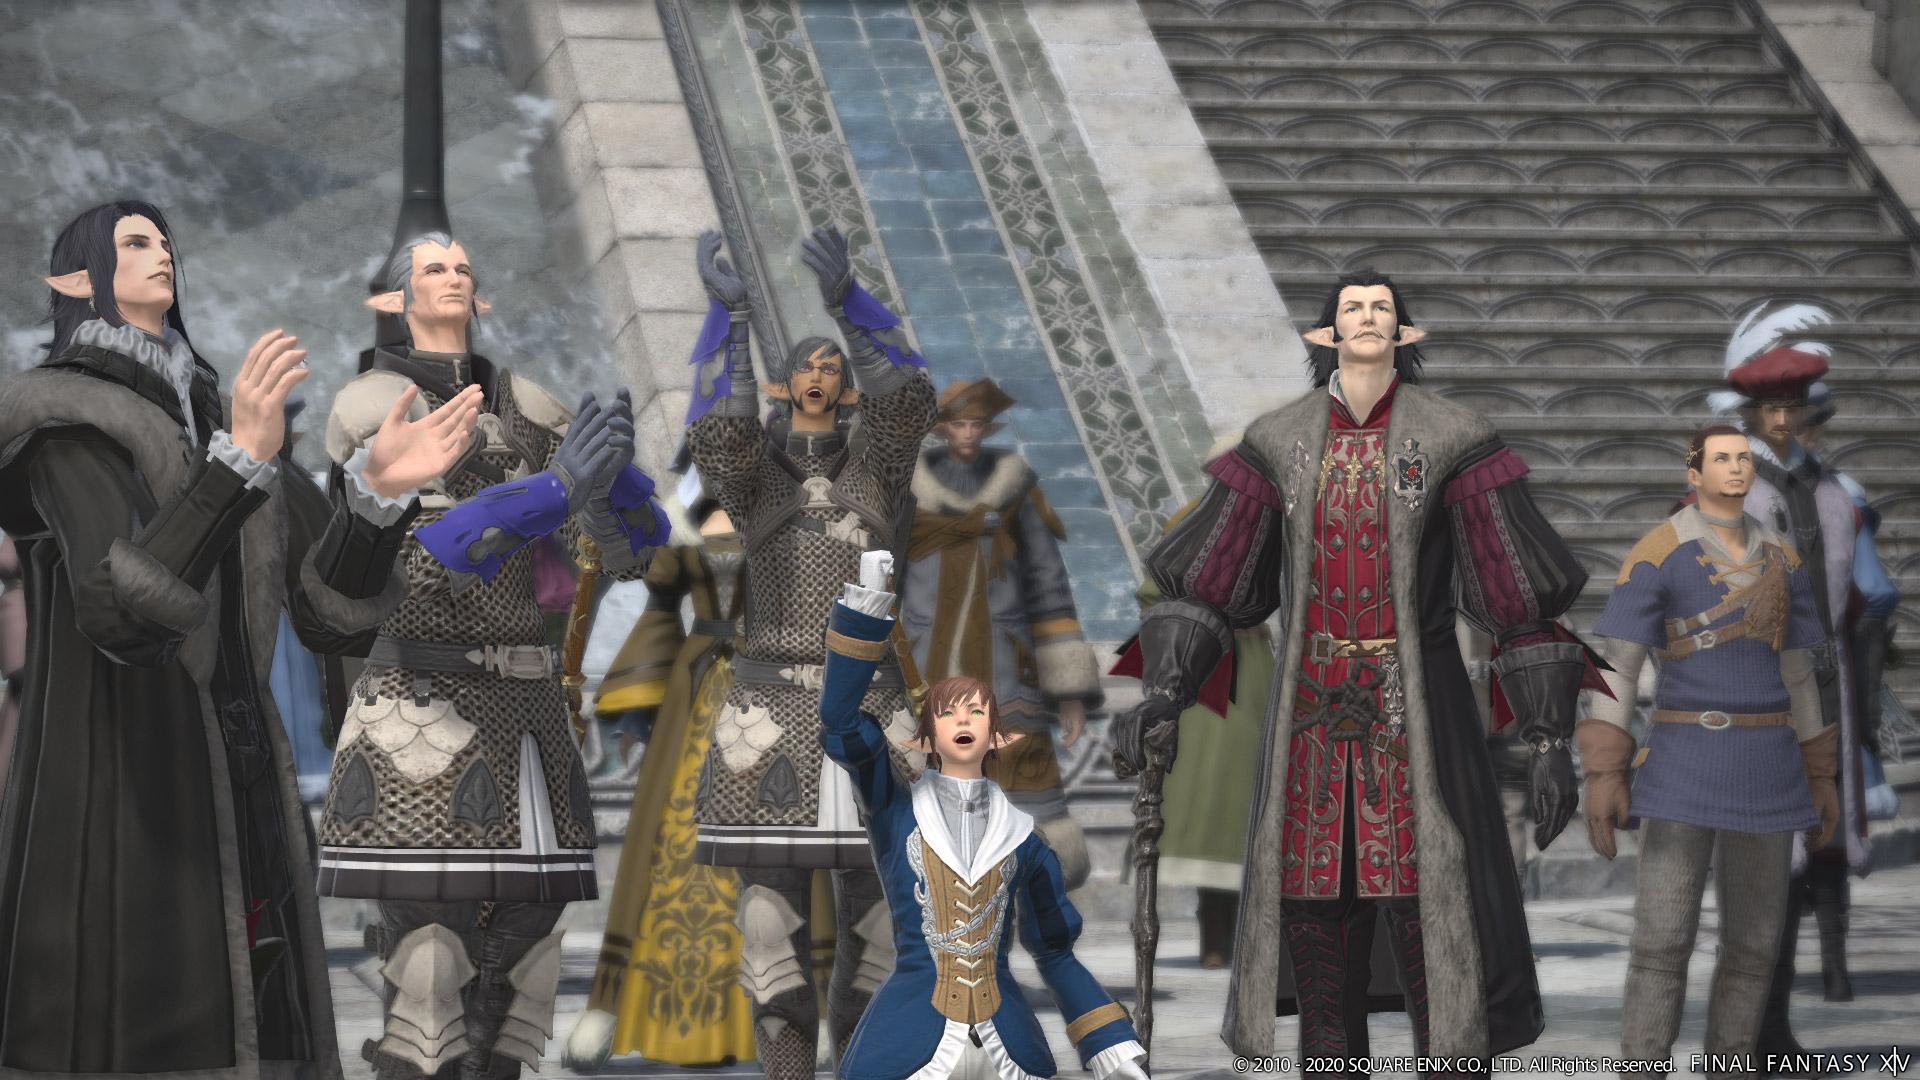 Final Fantasy XIV 5.4 Tomestone gear